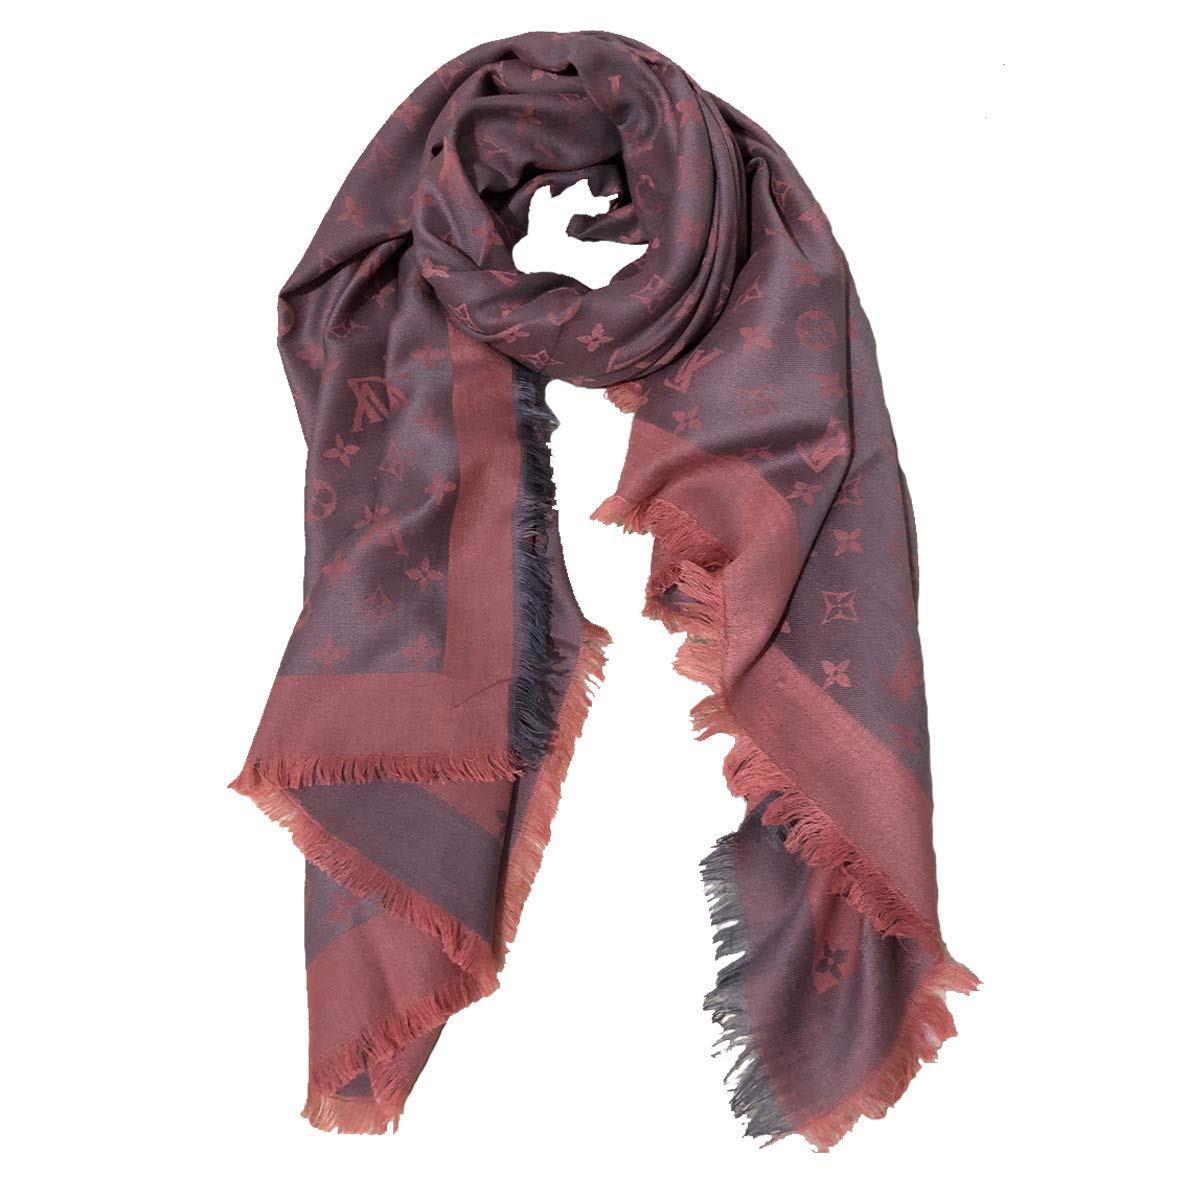 EHOO Fall Winter Cashmere Scarf Warm Scarves Fashion Luxury for Women